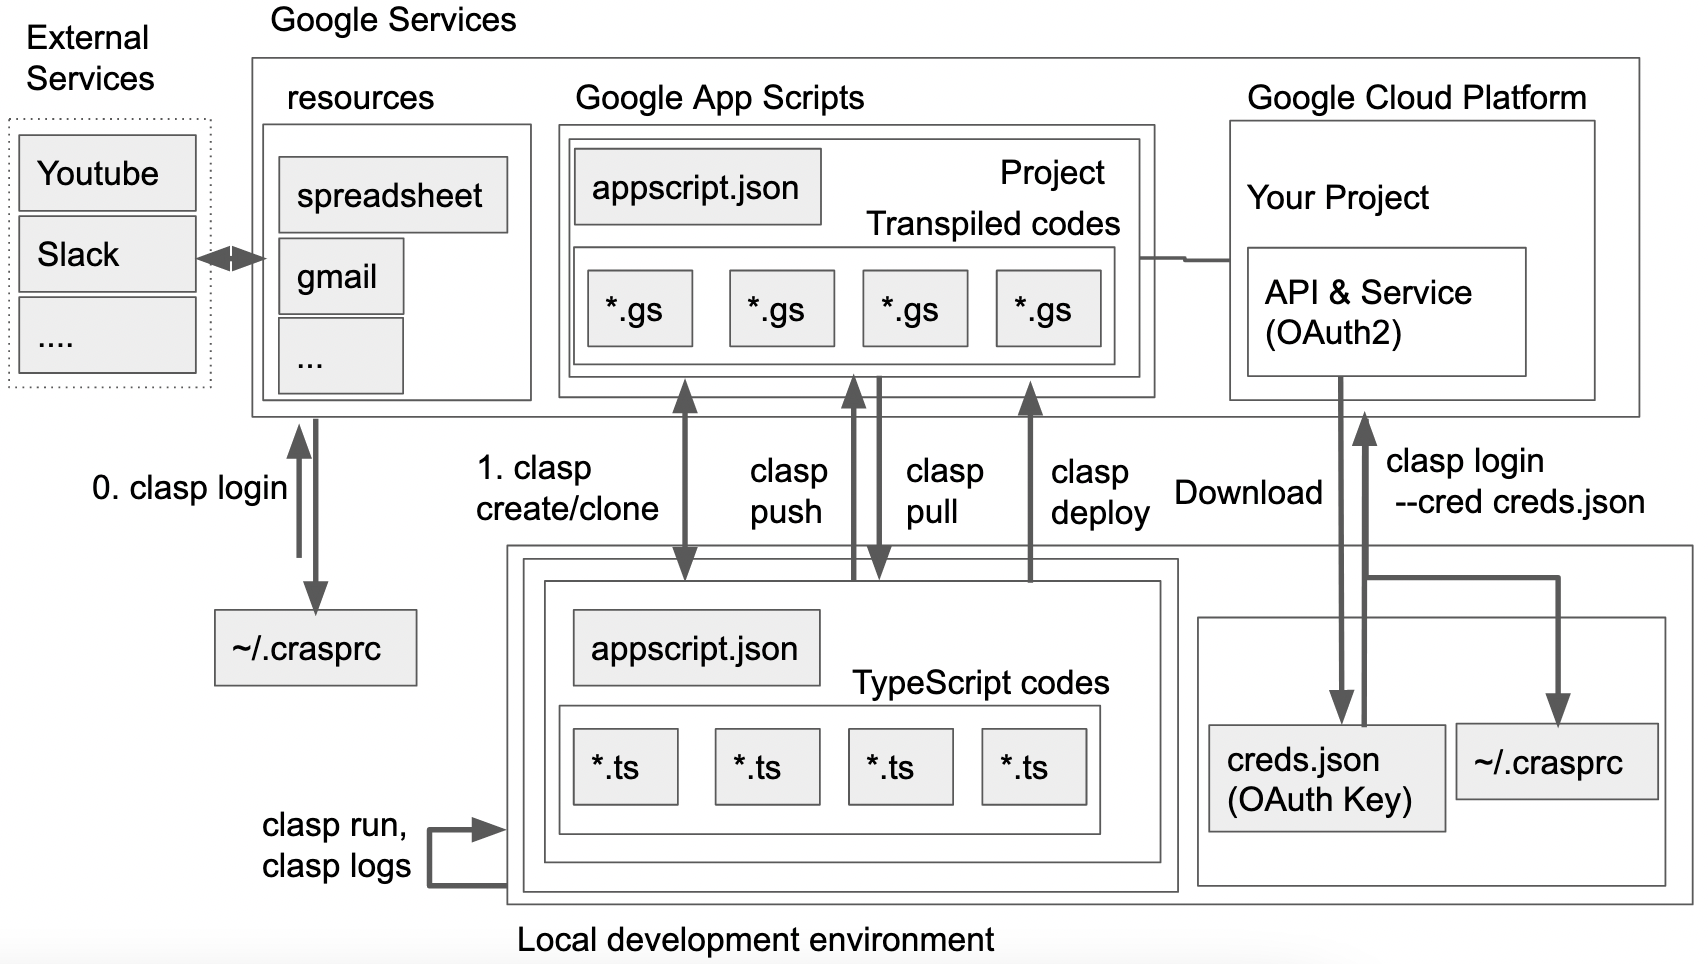 GAS, claspおよび関連するサービスの操作イメージ